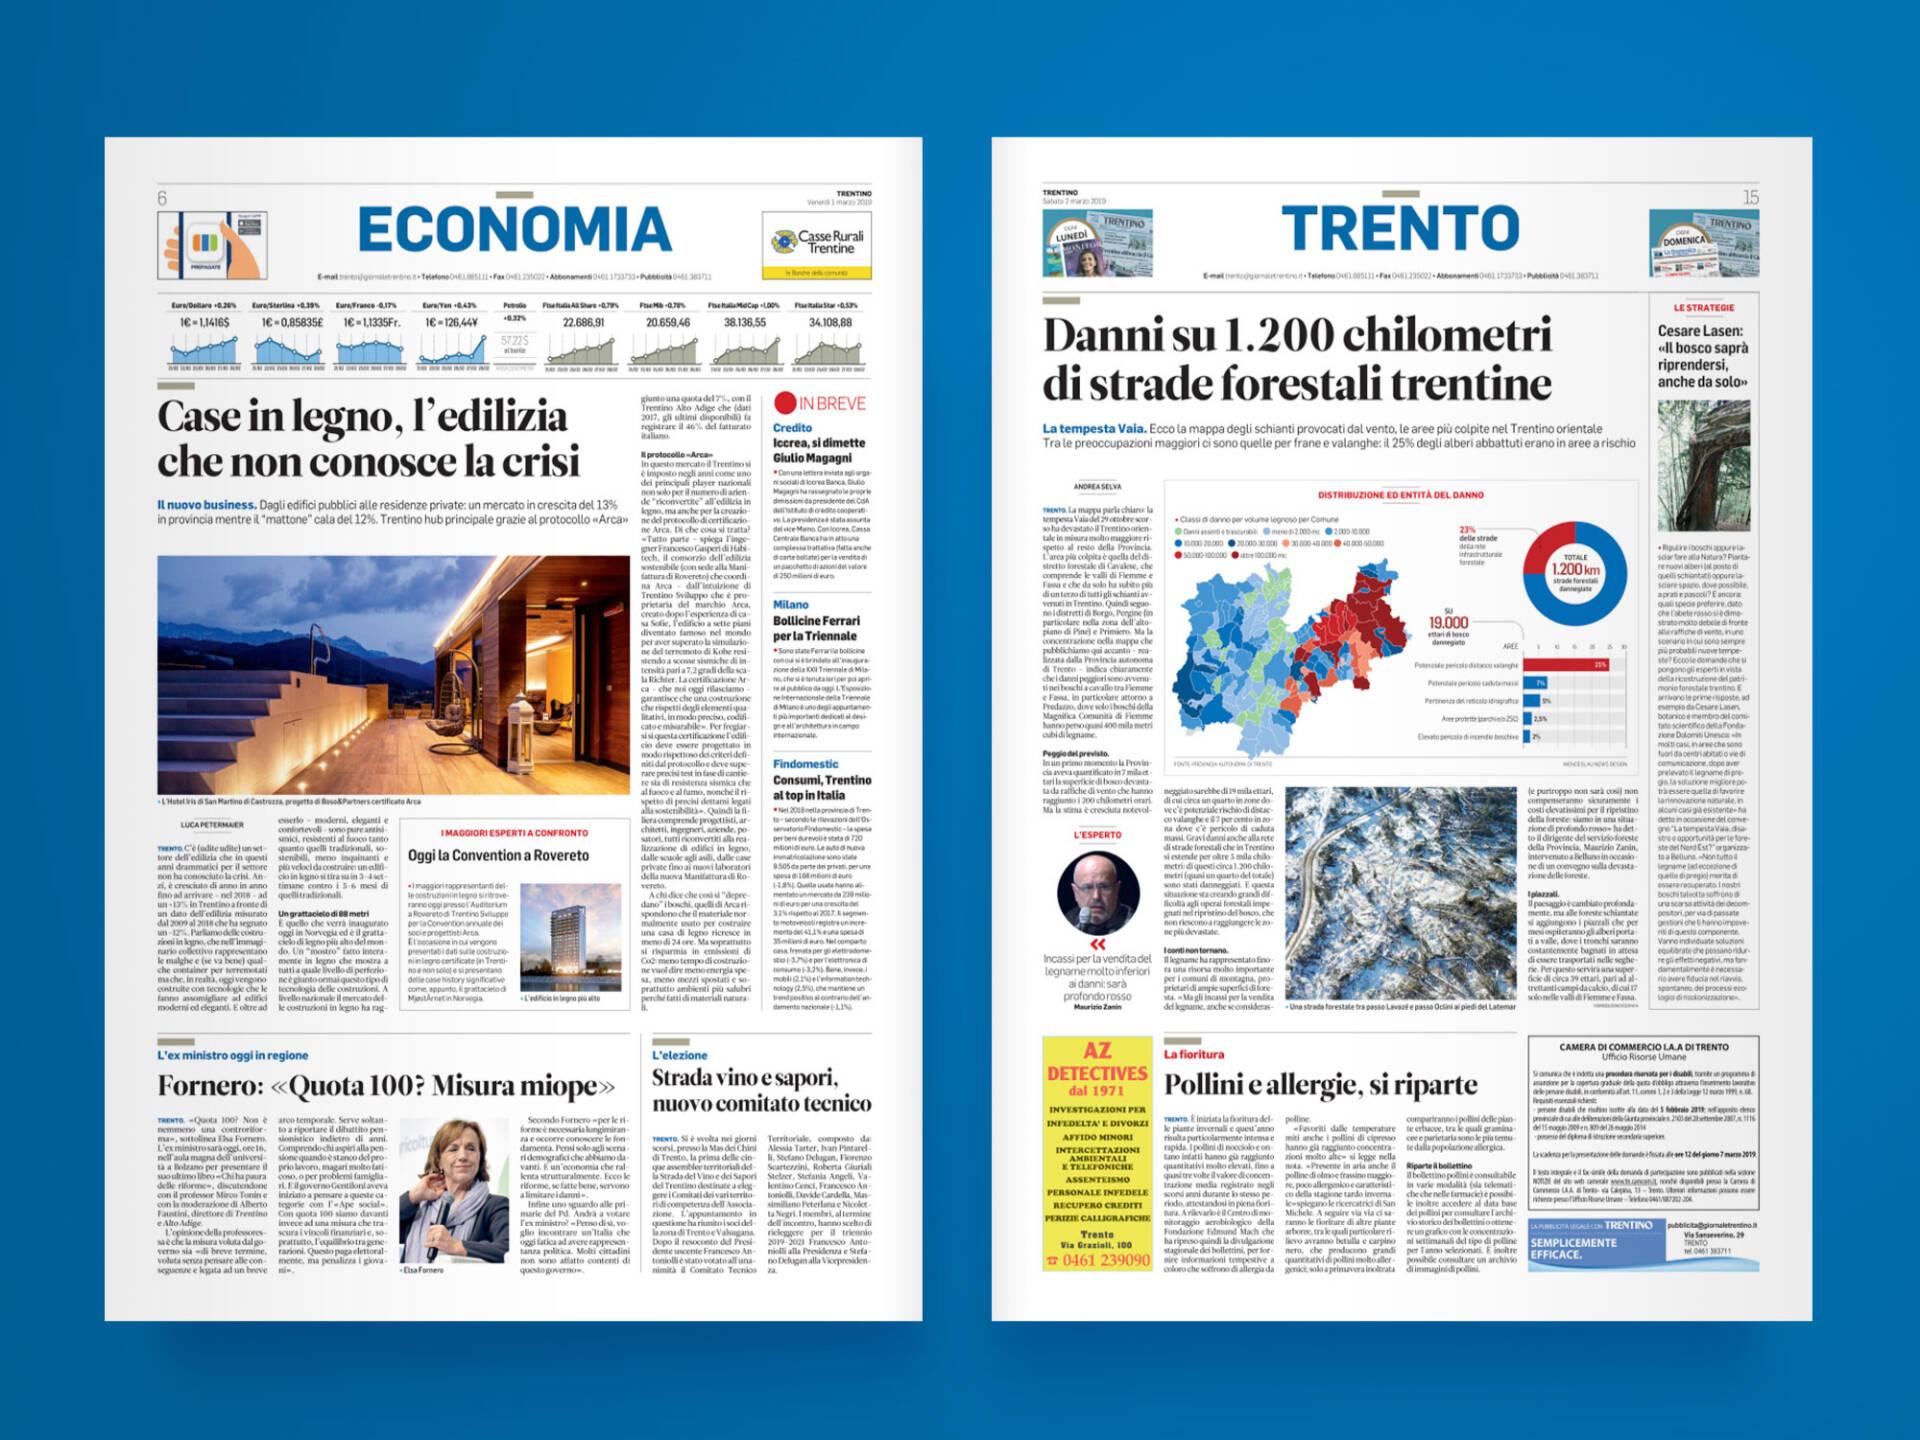 Trentino_07_Wenceslau_News_Design